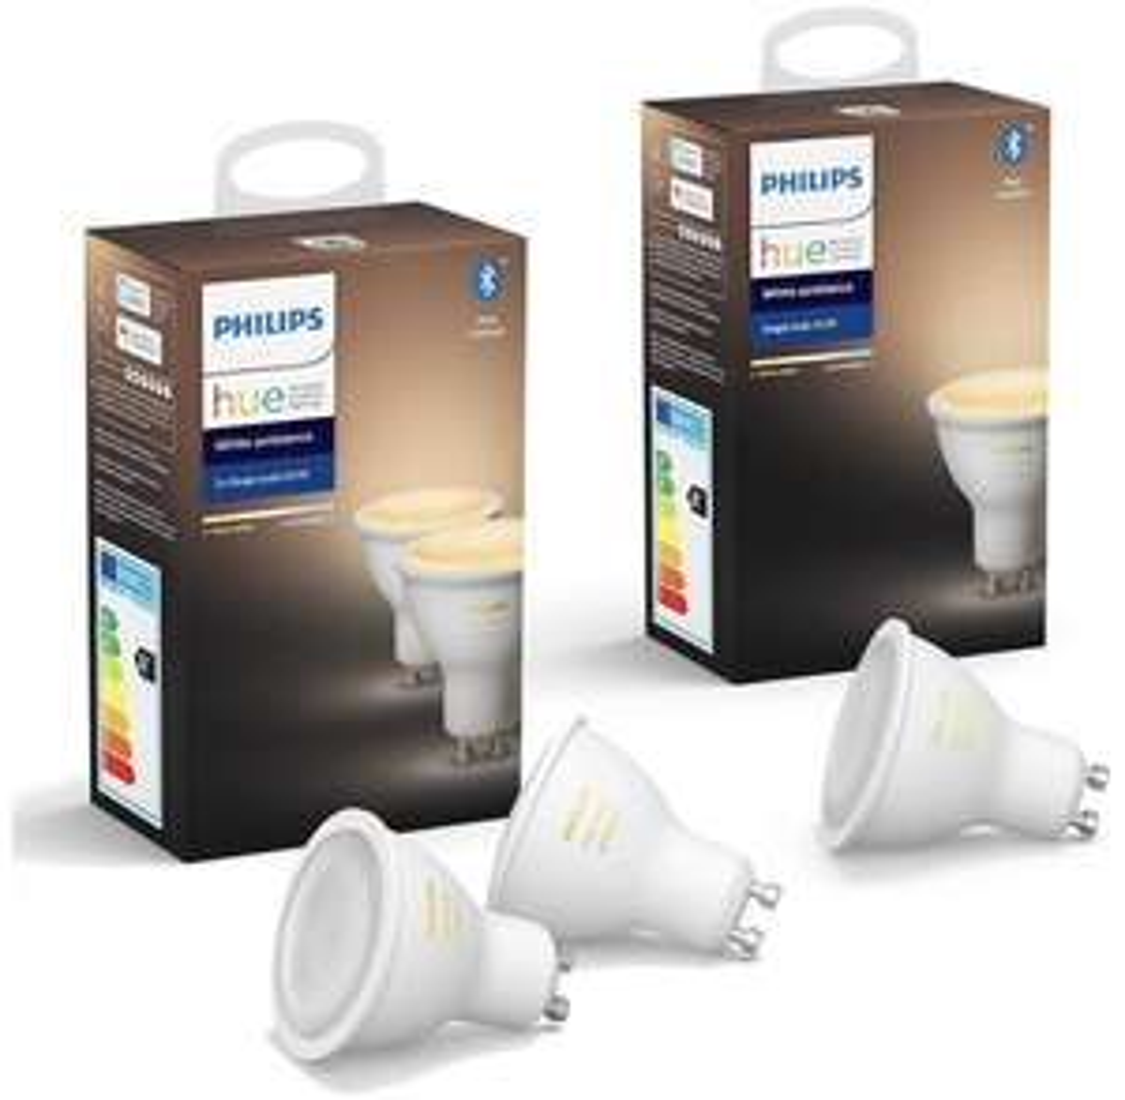 [Prime] Pack de 3 ampoules Philips Hue GU10 White Ambiance